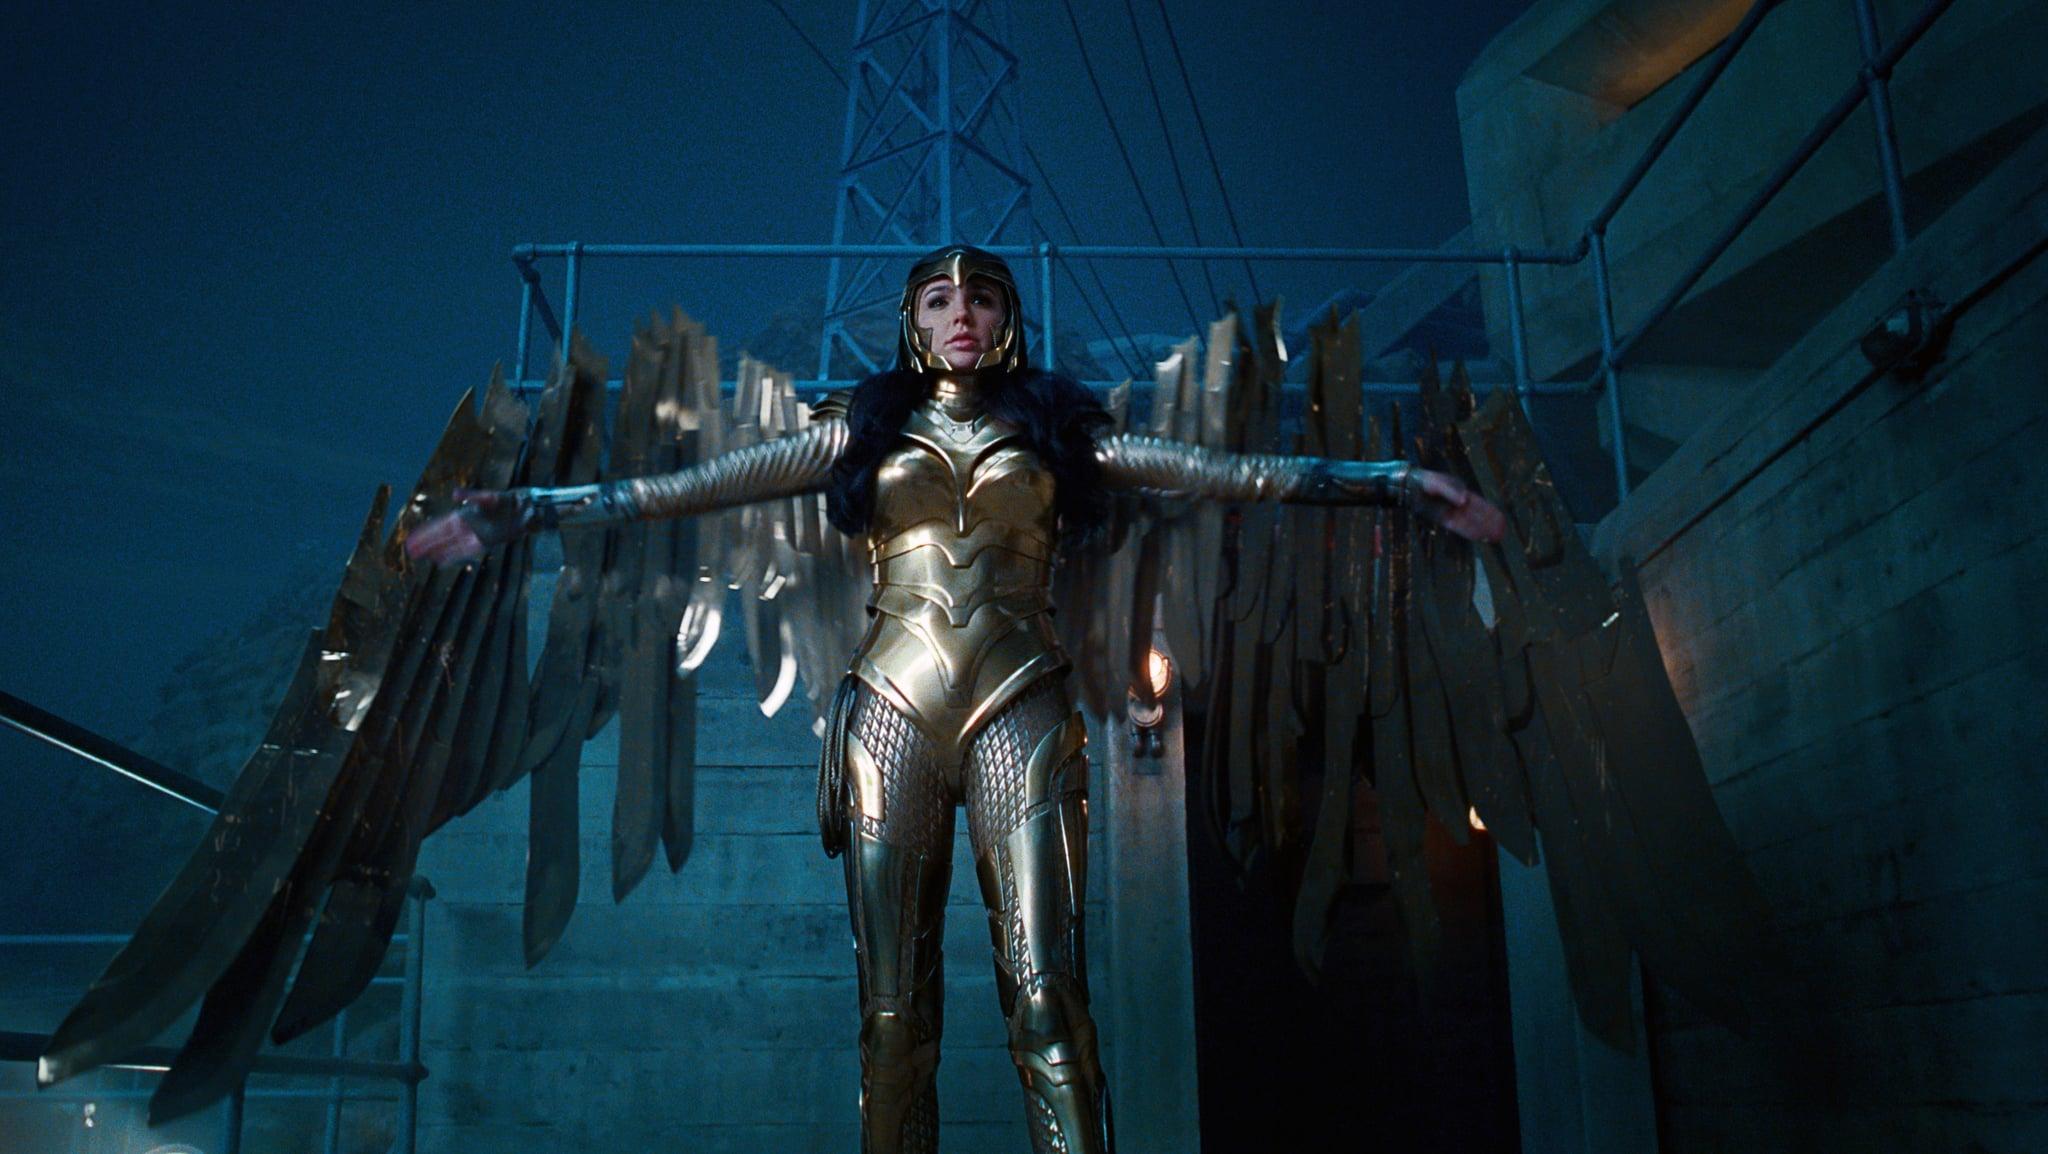 WONDER WOMAN 1984, Gal Gadot as Diana Prince / Wonder Woman, 2020.  Warner Bros. / Courtesy Everett Collection